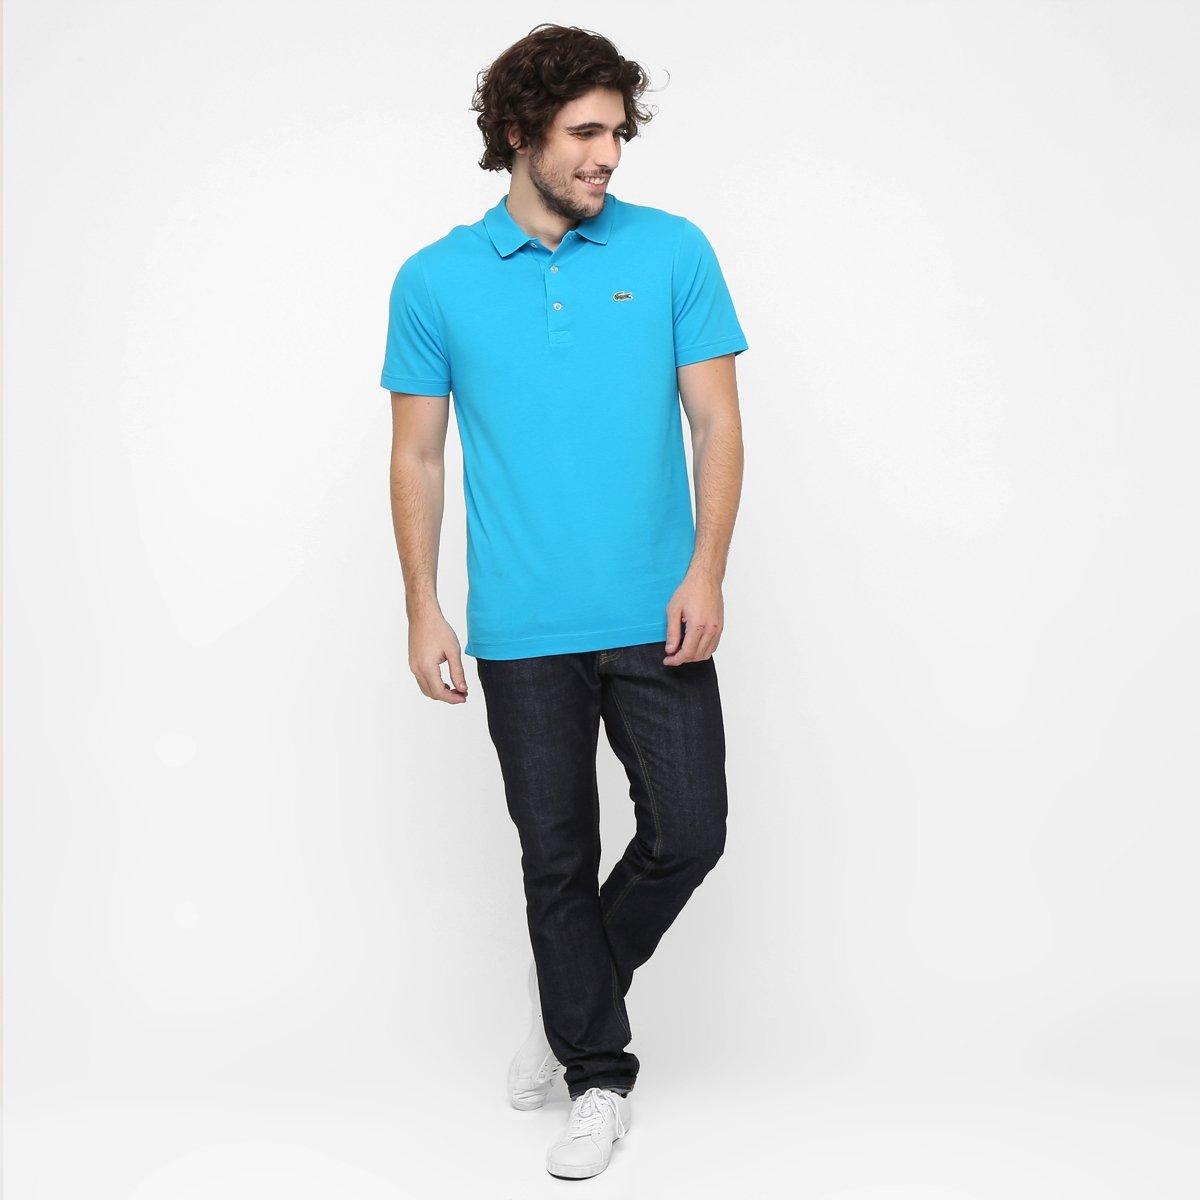 aad5b4e928 Camisa Polo Lacoste Super Light Masculina - Azul Piscina e Verde ...